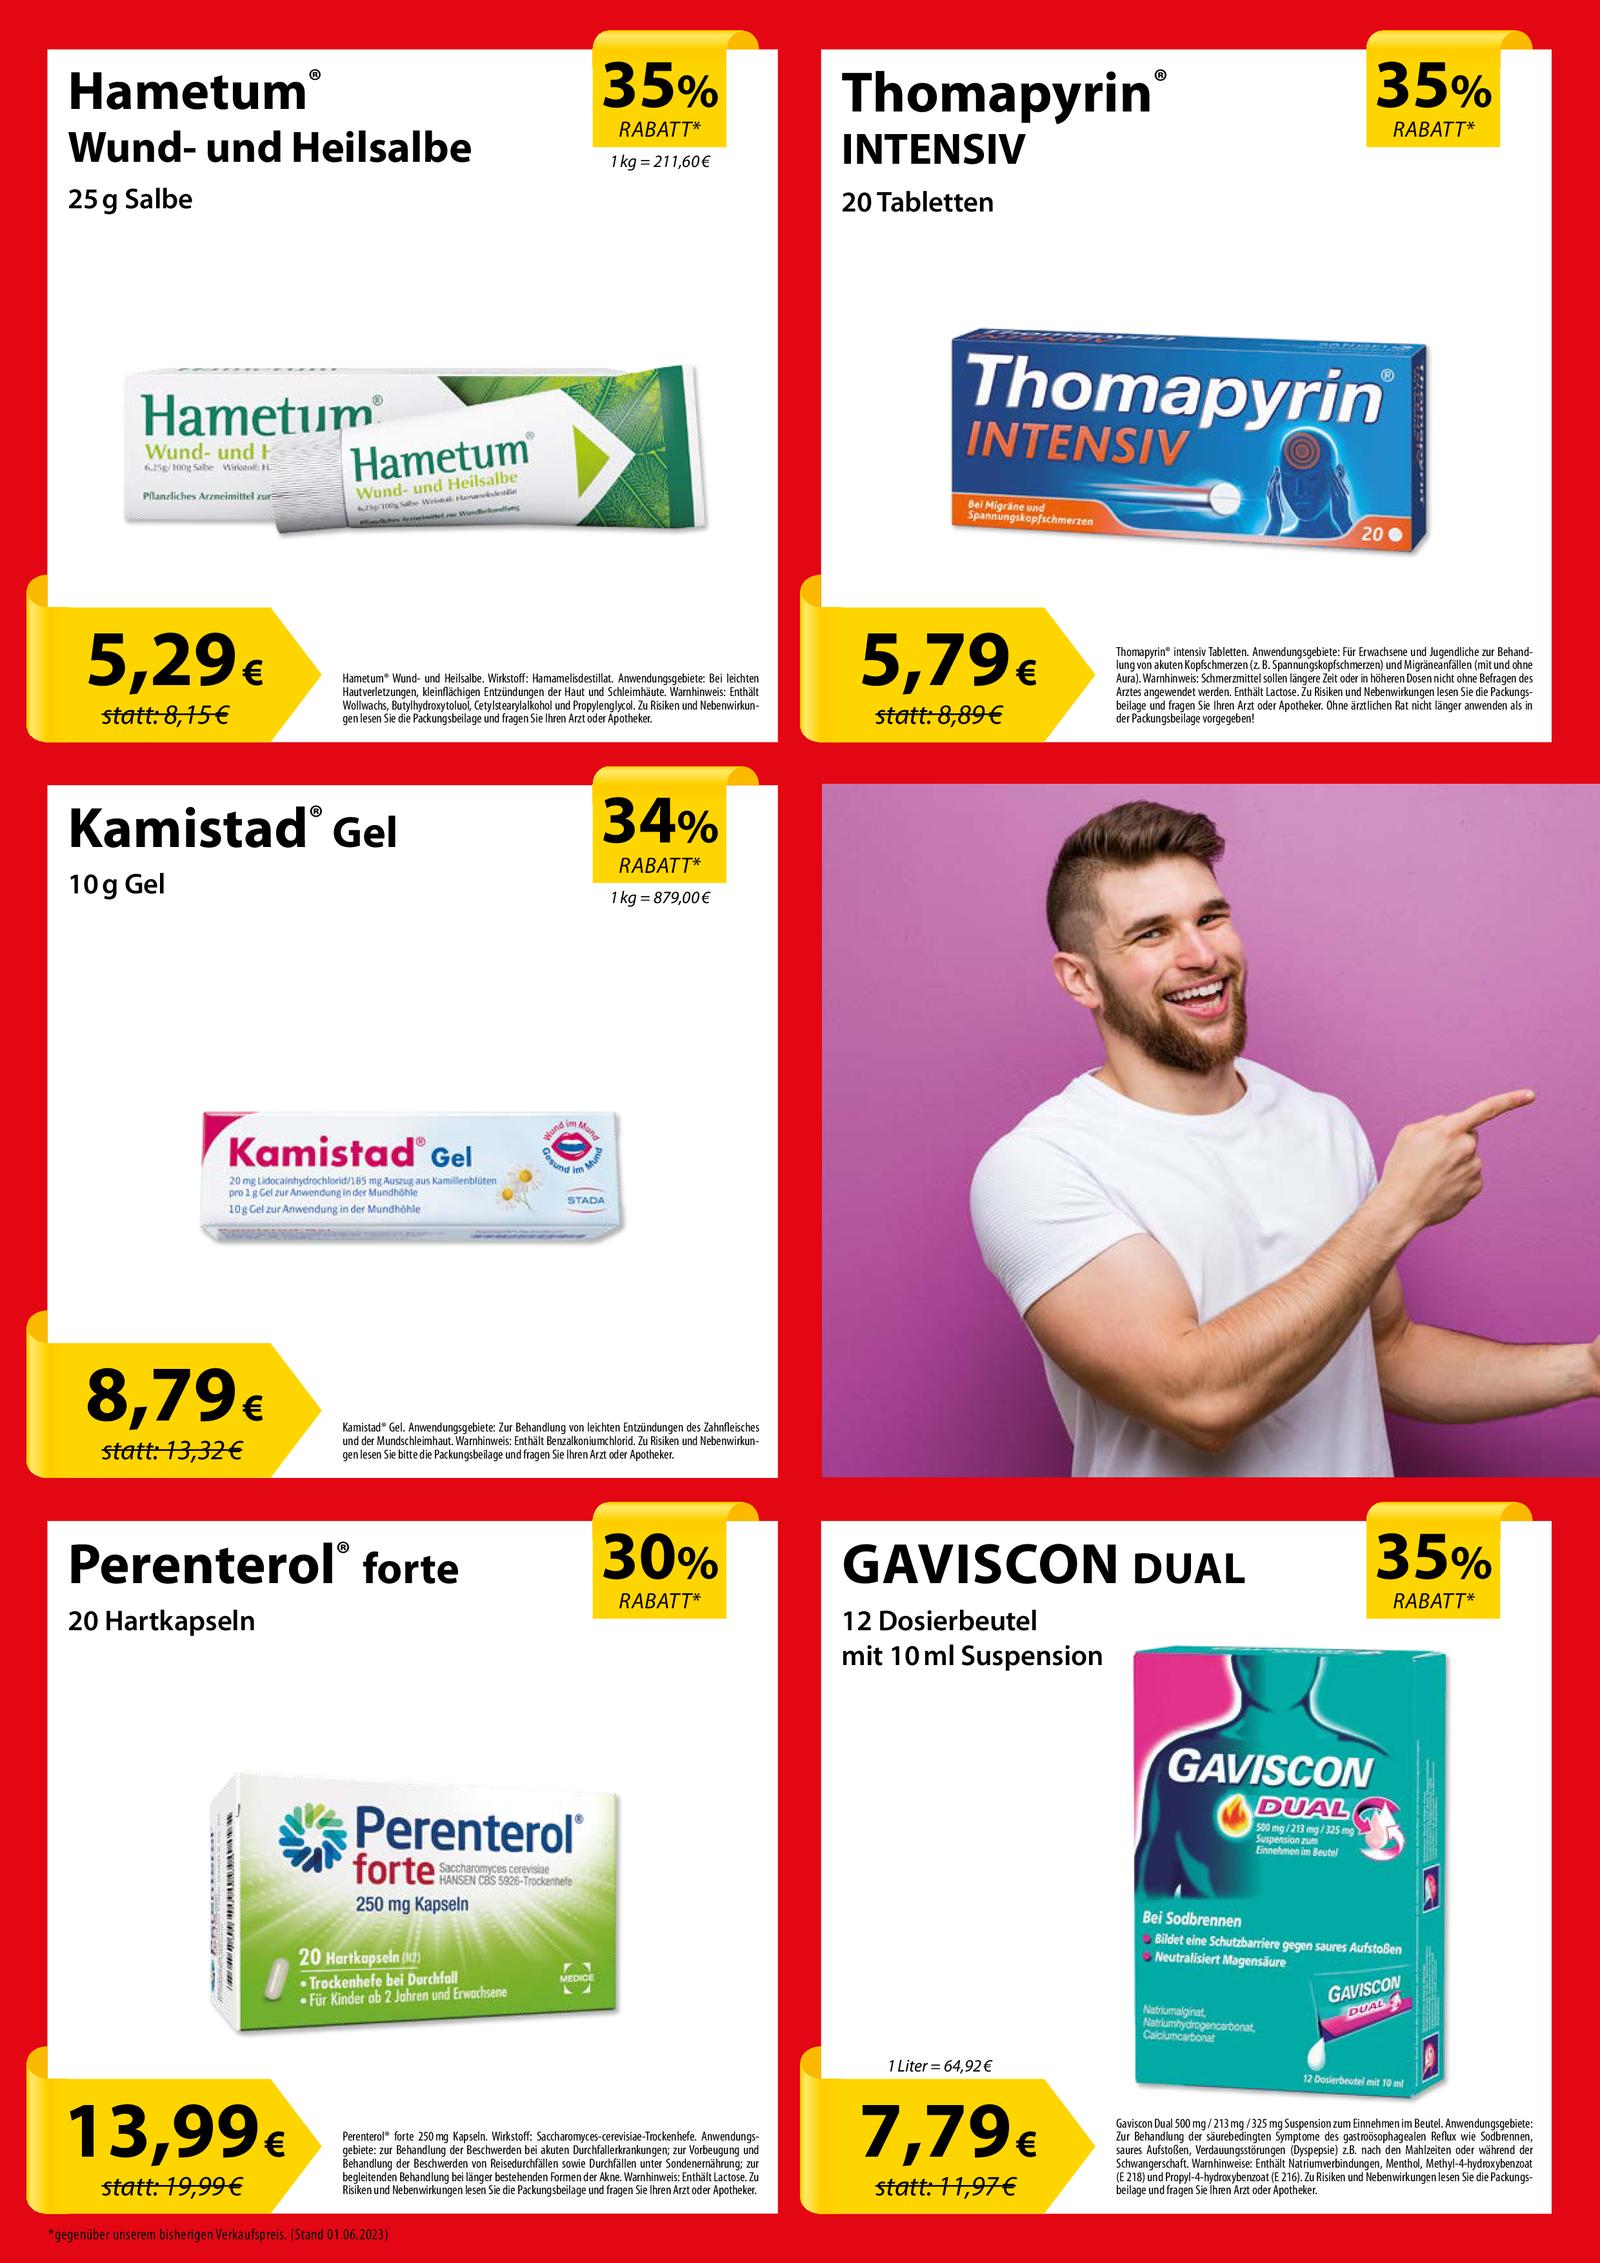 https://mein-uploads.apocdn.net/11932/leaflets/11932_flyer-Seite2.png